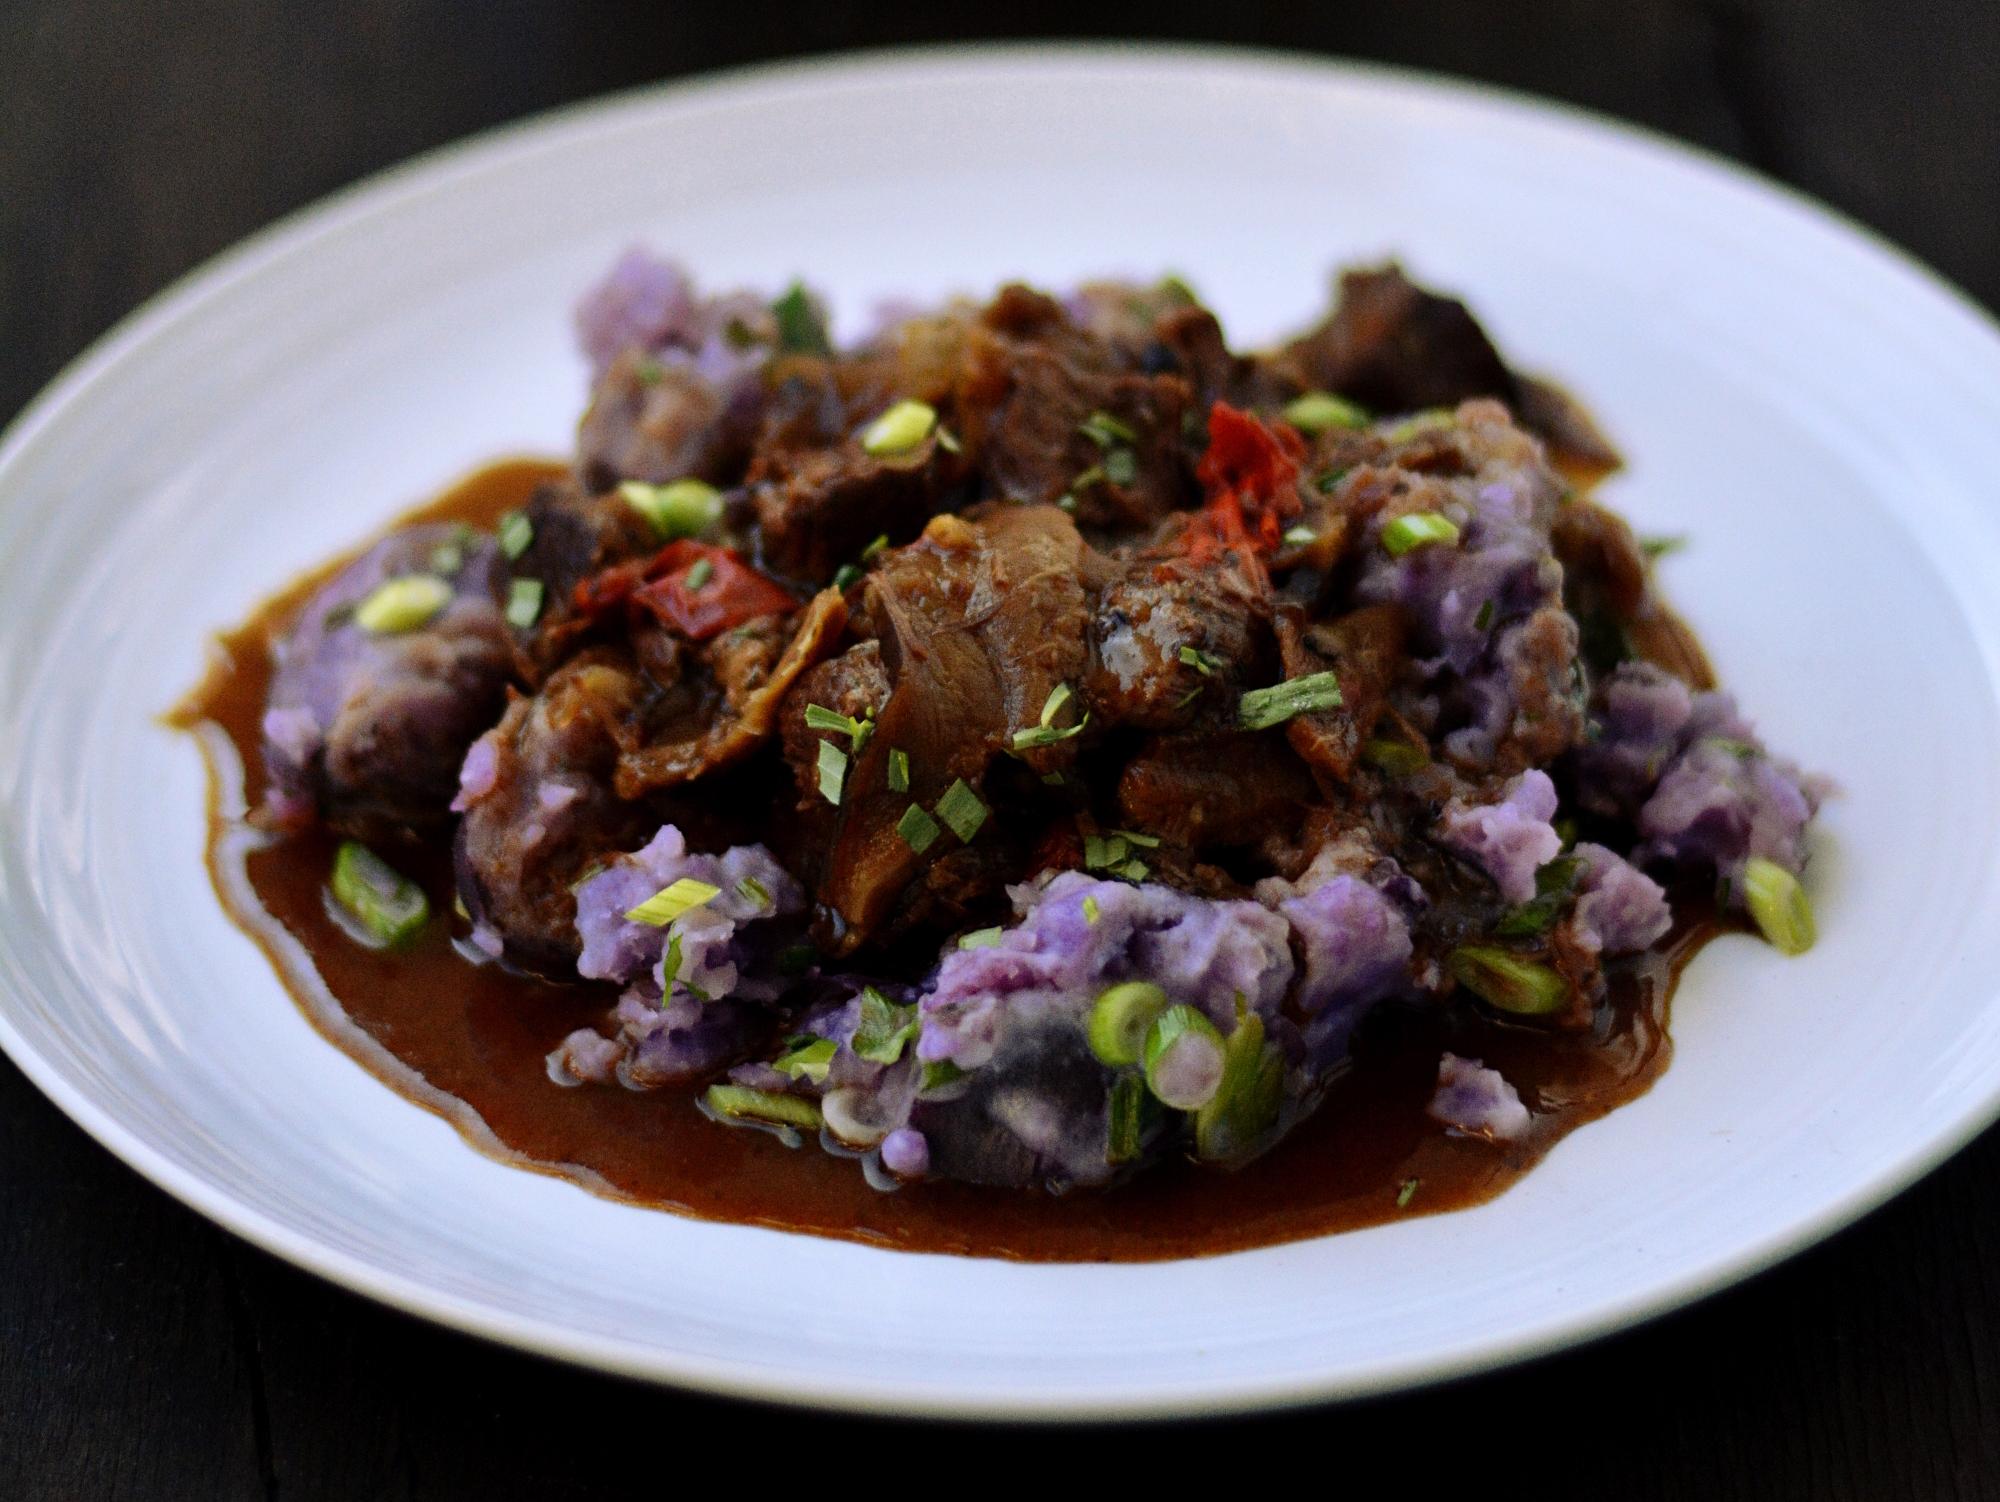 ox-cheek-stew-with-purple-potatoes-header.jpg